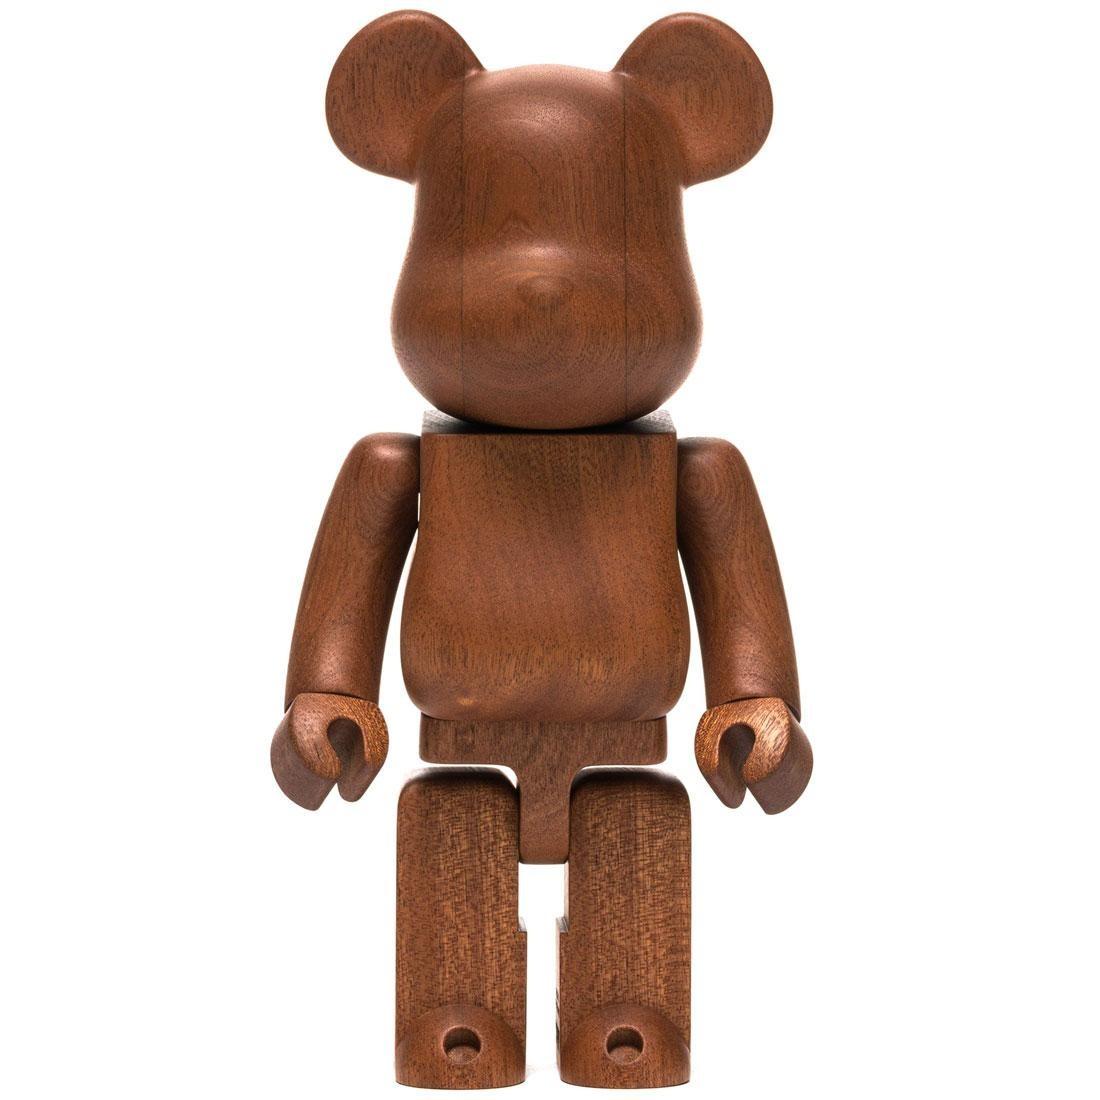 441b2094 Medicom Karimoku Sapele 400% Bearbrick Figure brown